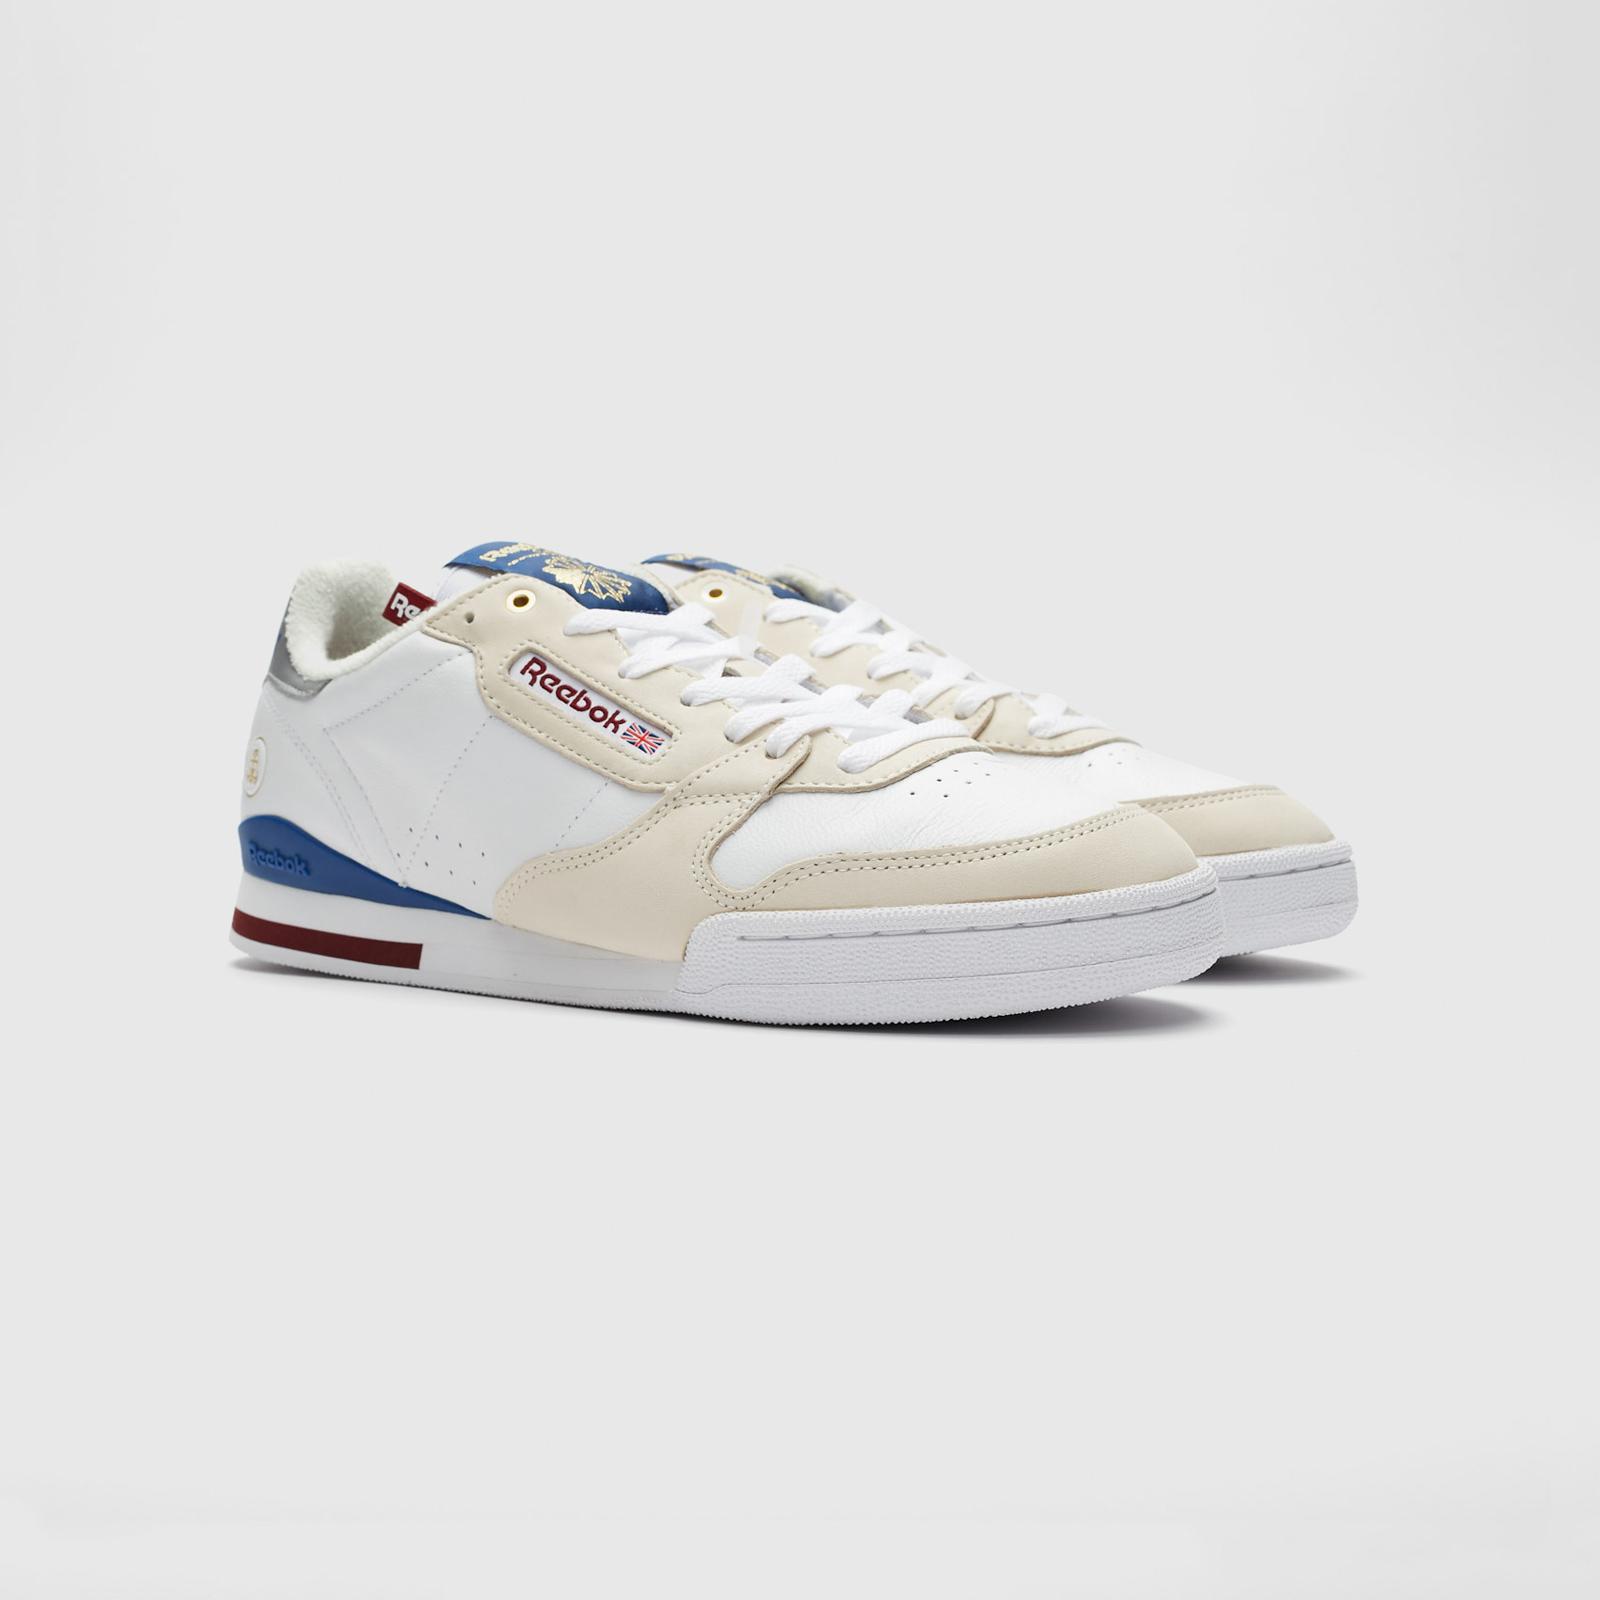 03446eba7ed Reebok Phase 1 MU x Foot Patrol x HAL - Cn6136 - Sneakersnstuff ...